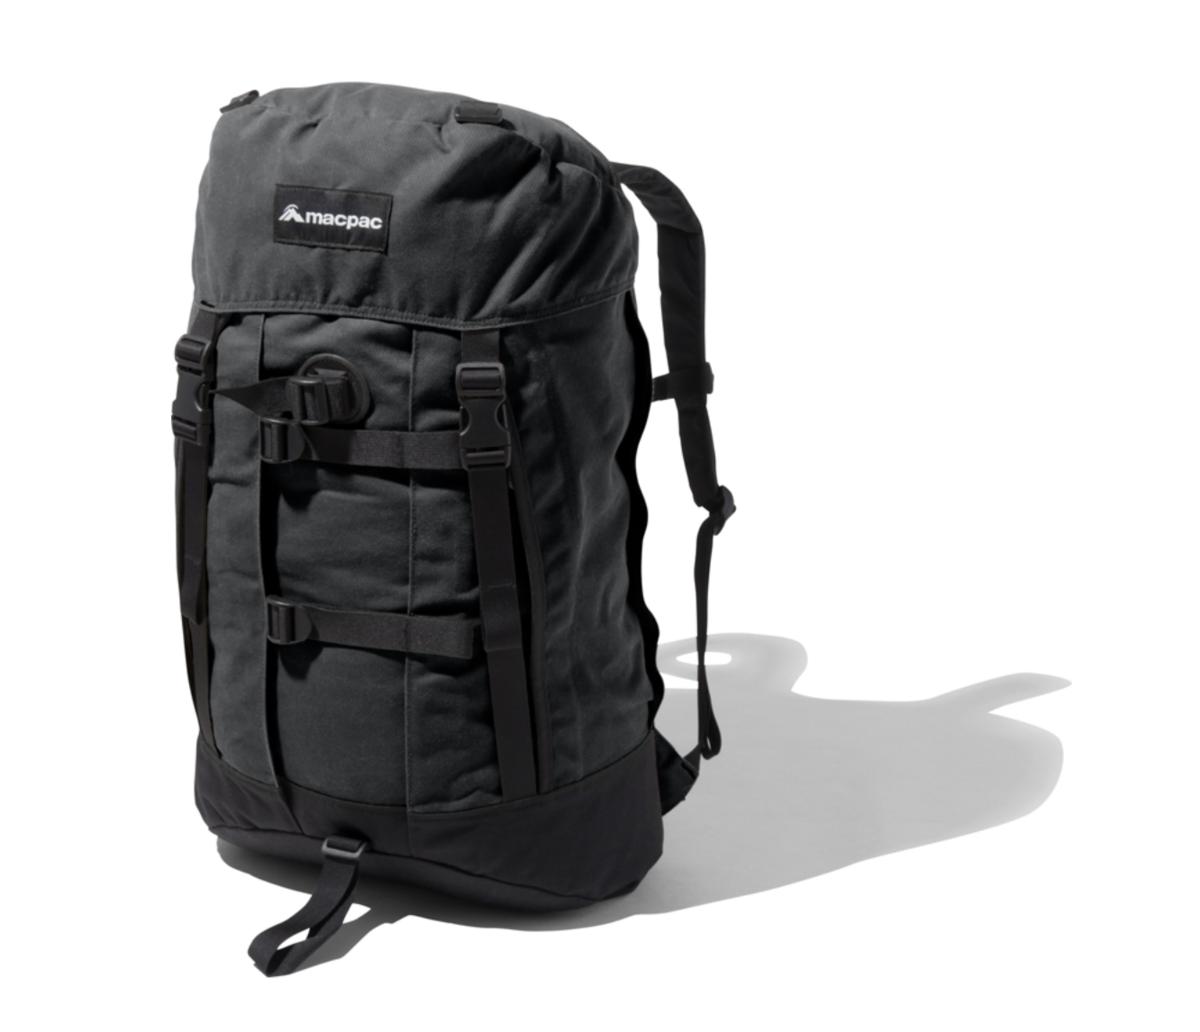 f:id:thebackpack:20191006102512p:plain